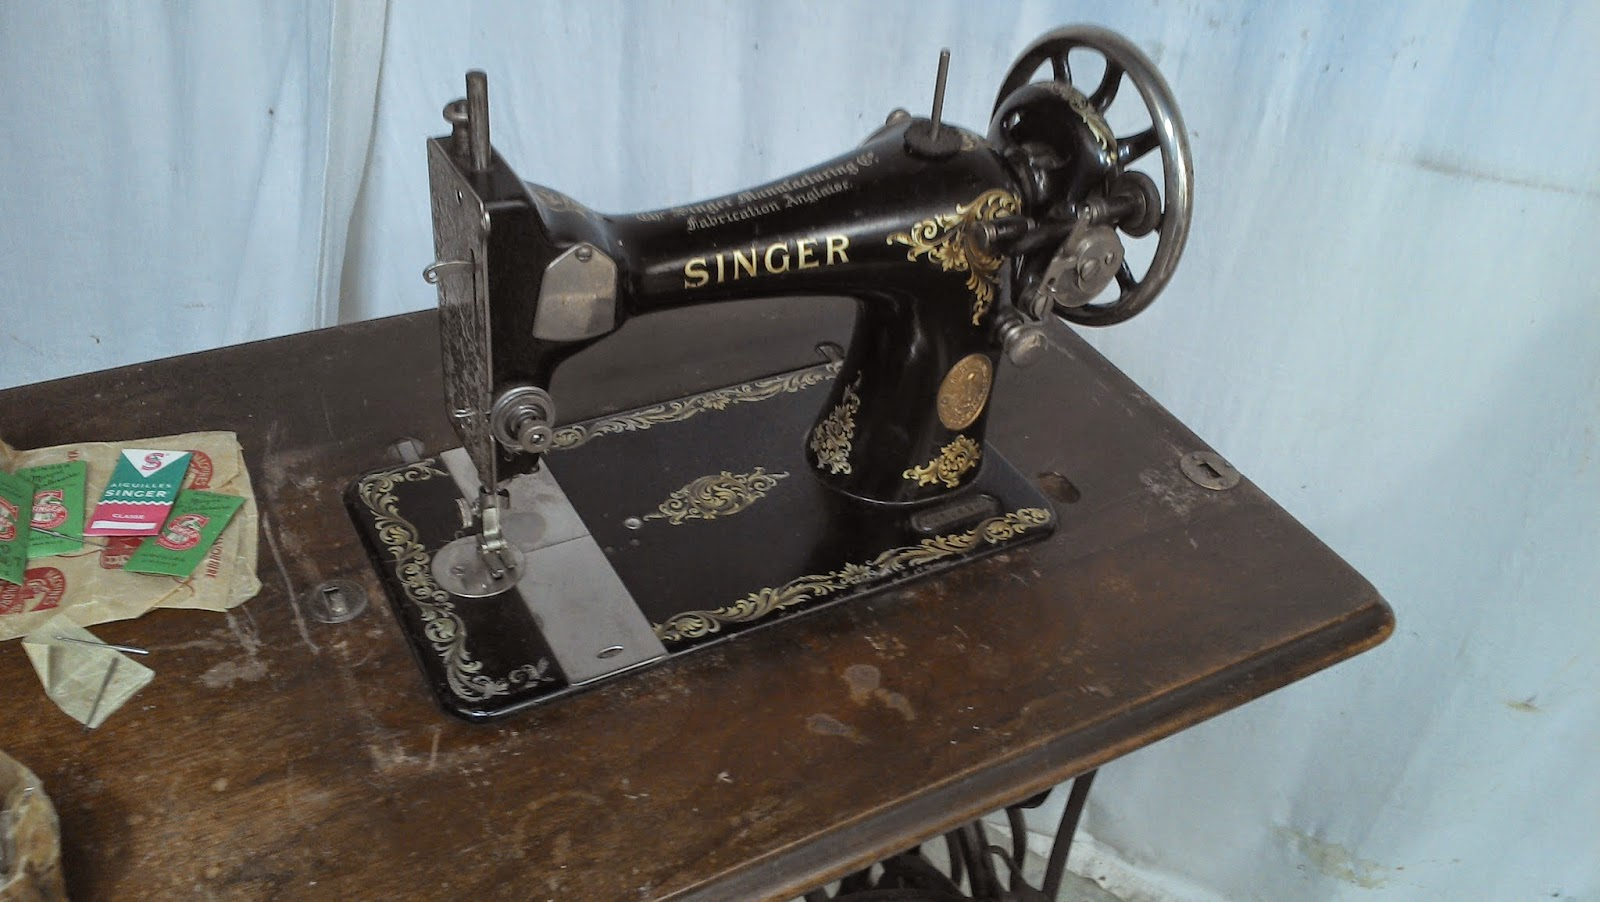 ancienne machine a coudre singer pi tement en m tal fer forg fonte xixeme. Black Bedroom Furniture Sets. Home Design Ideas